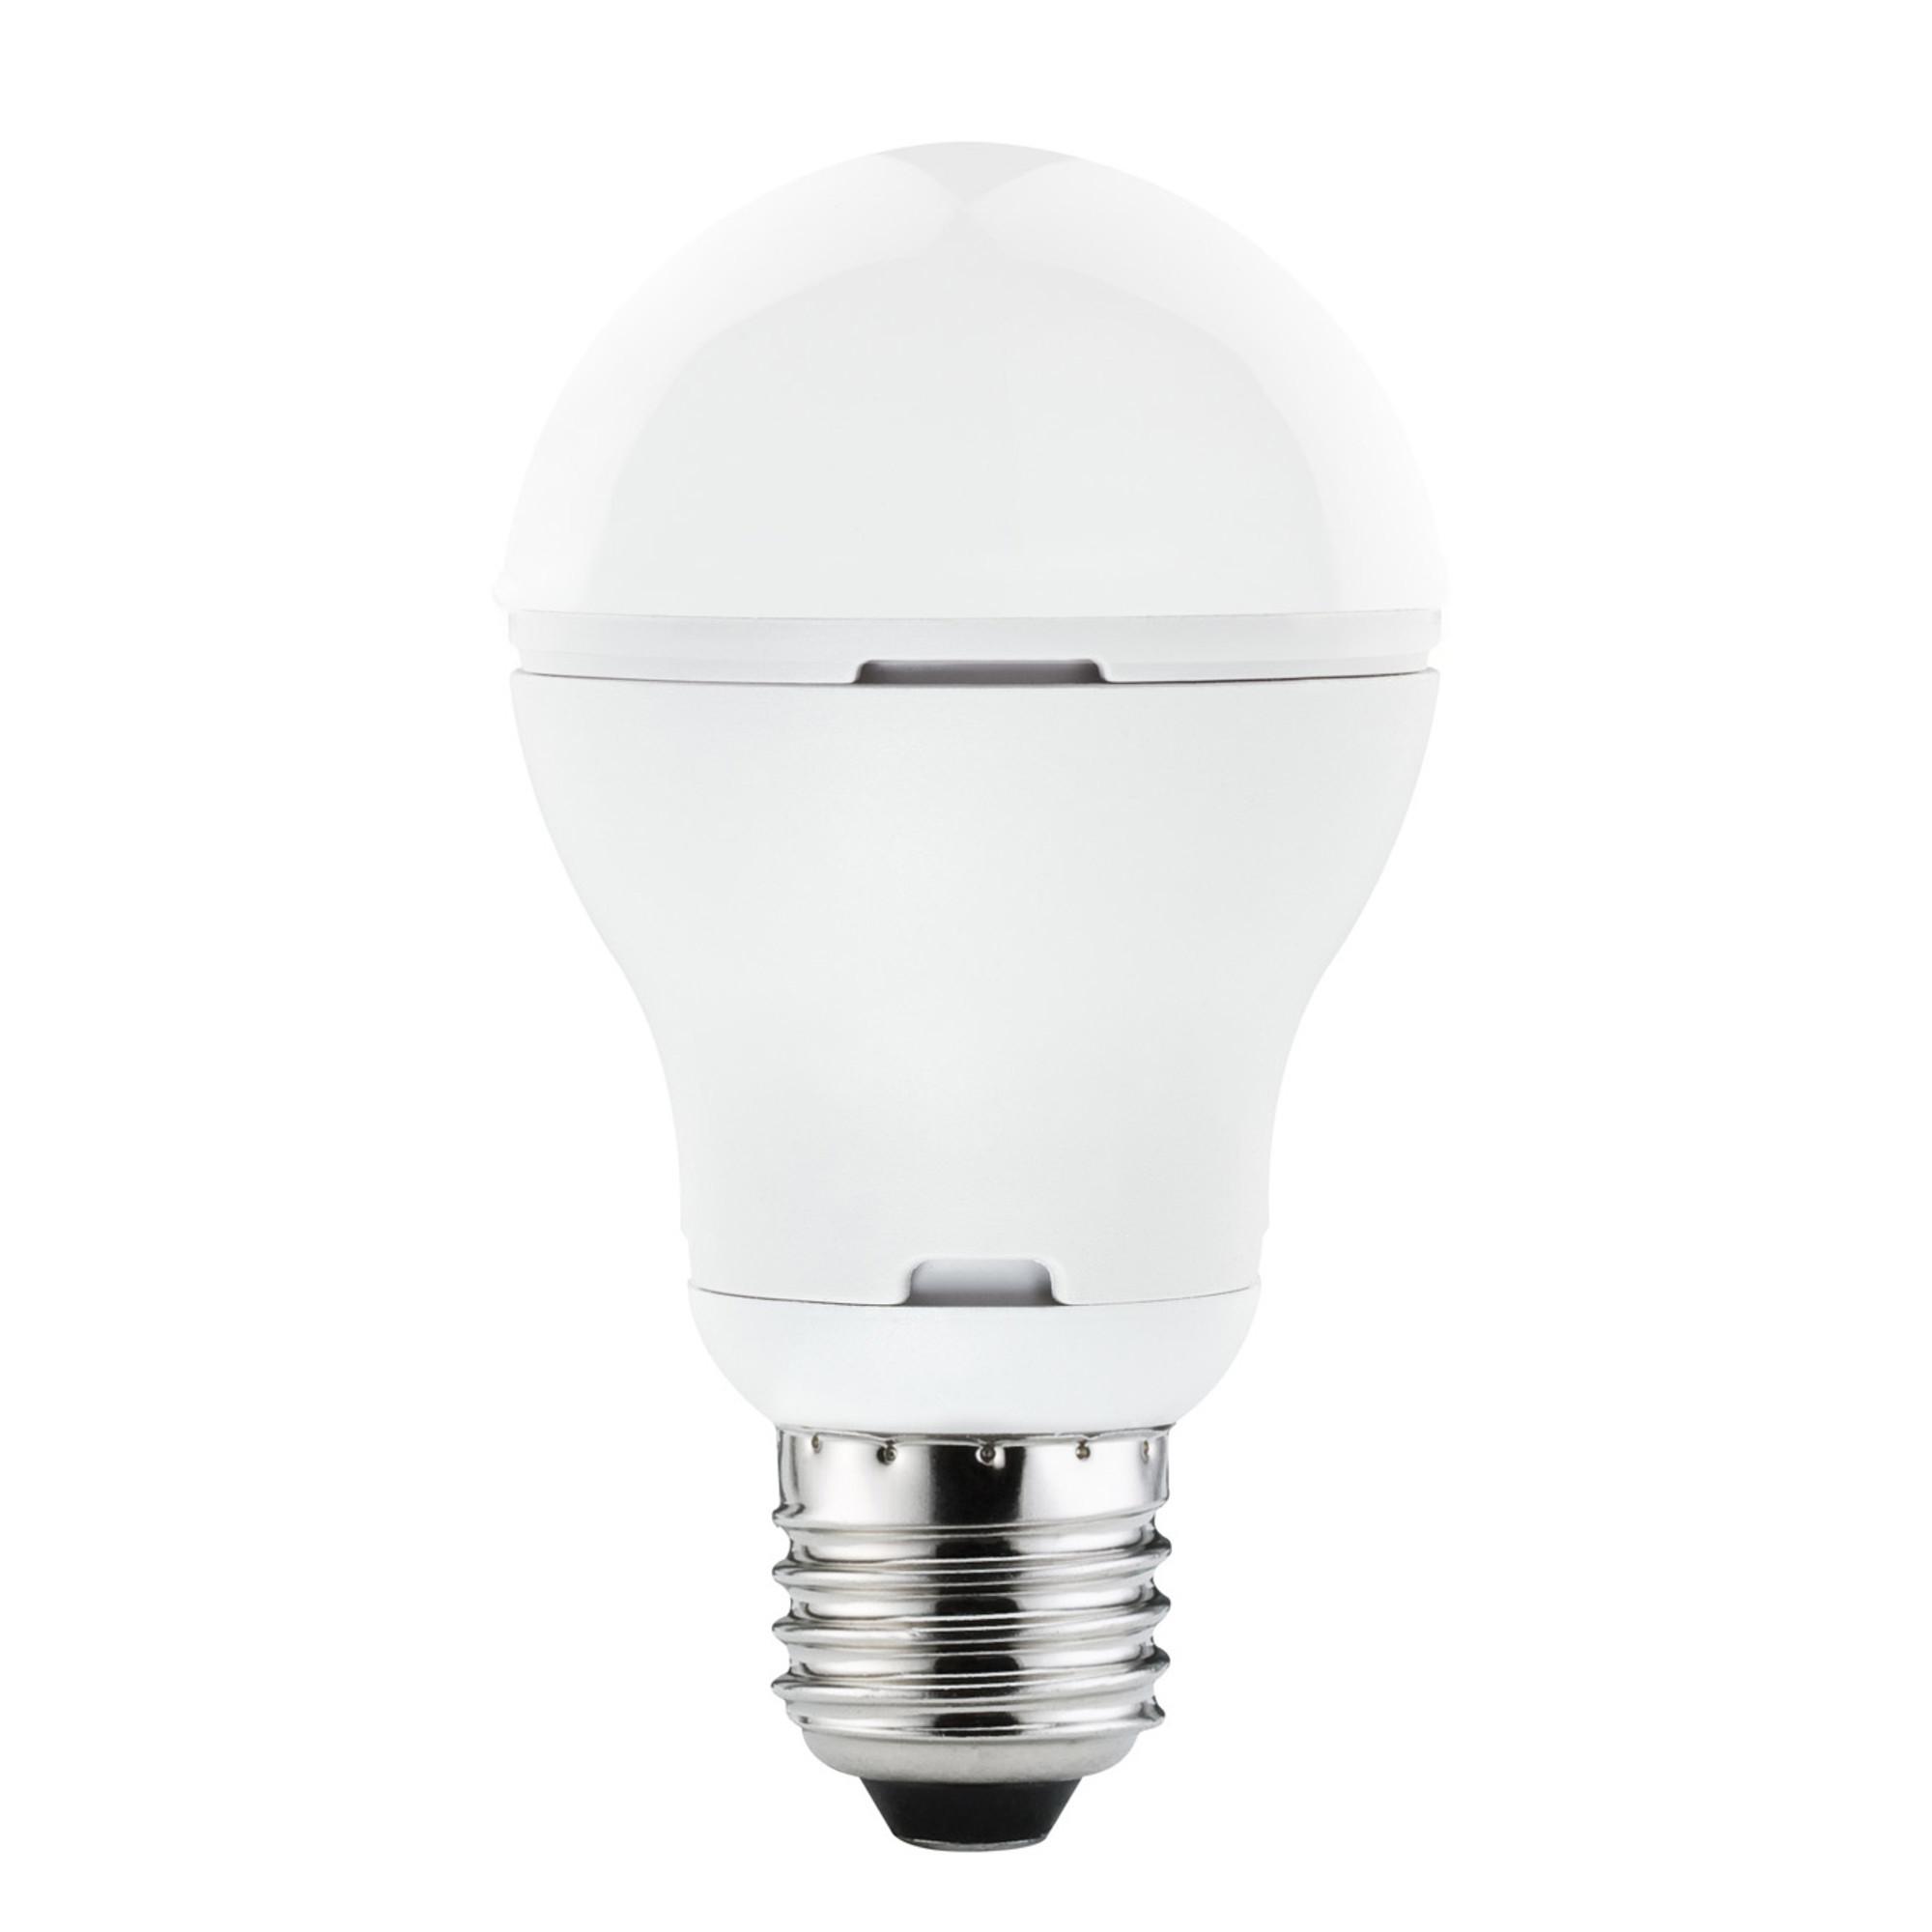 Лампа светодиодная Paulmann 28217 E27 1 Лм теплый свет